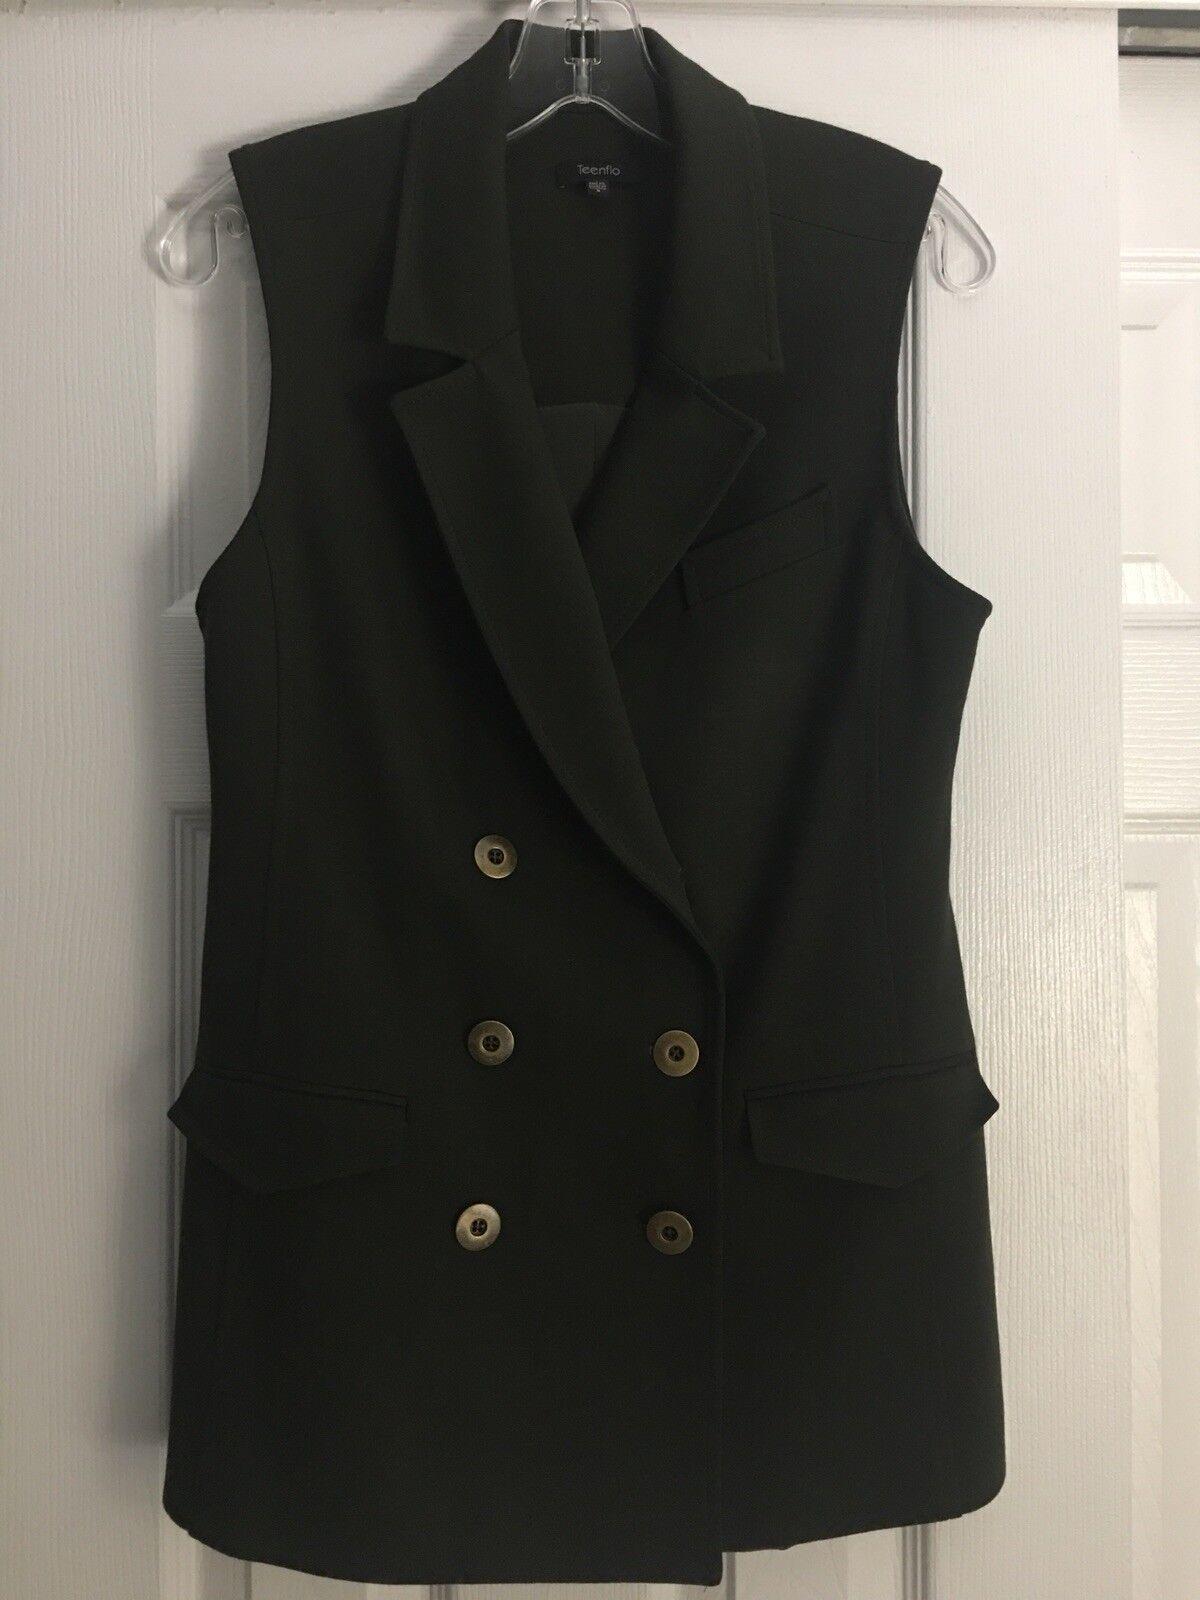 4304e050ee9 TeenFlo Womens Size 6 Dark Green Blazer Sleeveless nwmrzg5495-Coats ...